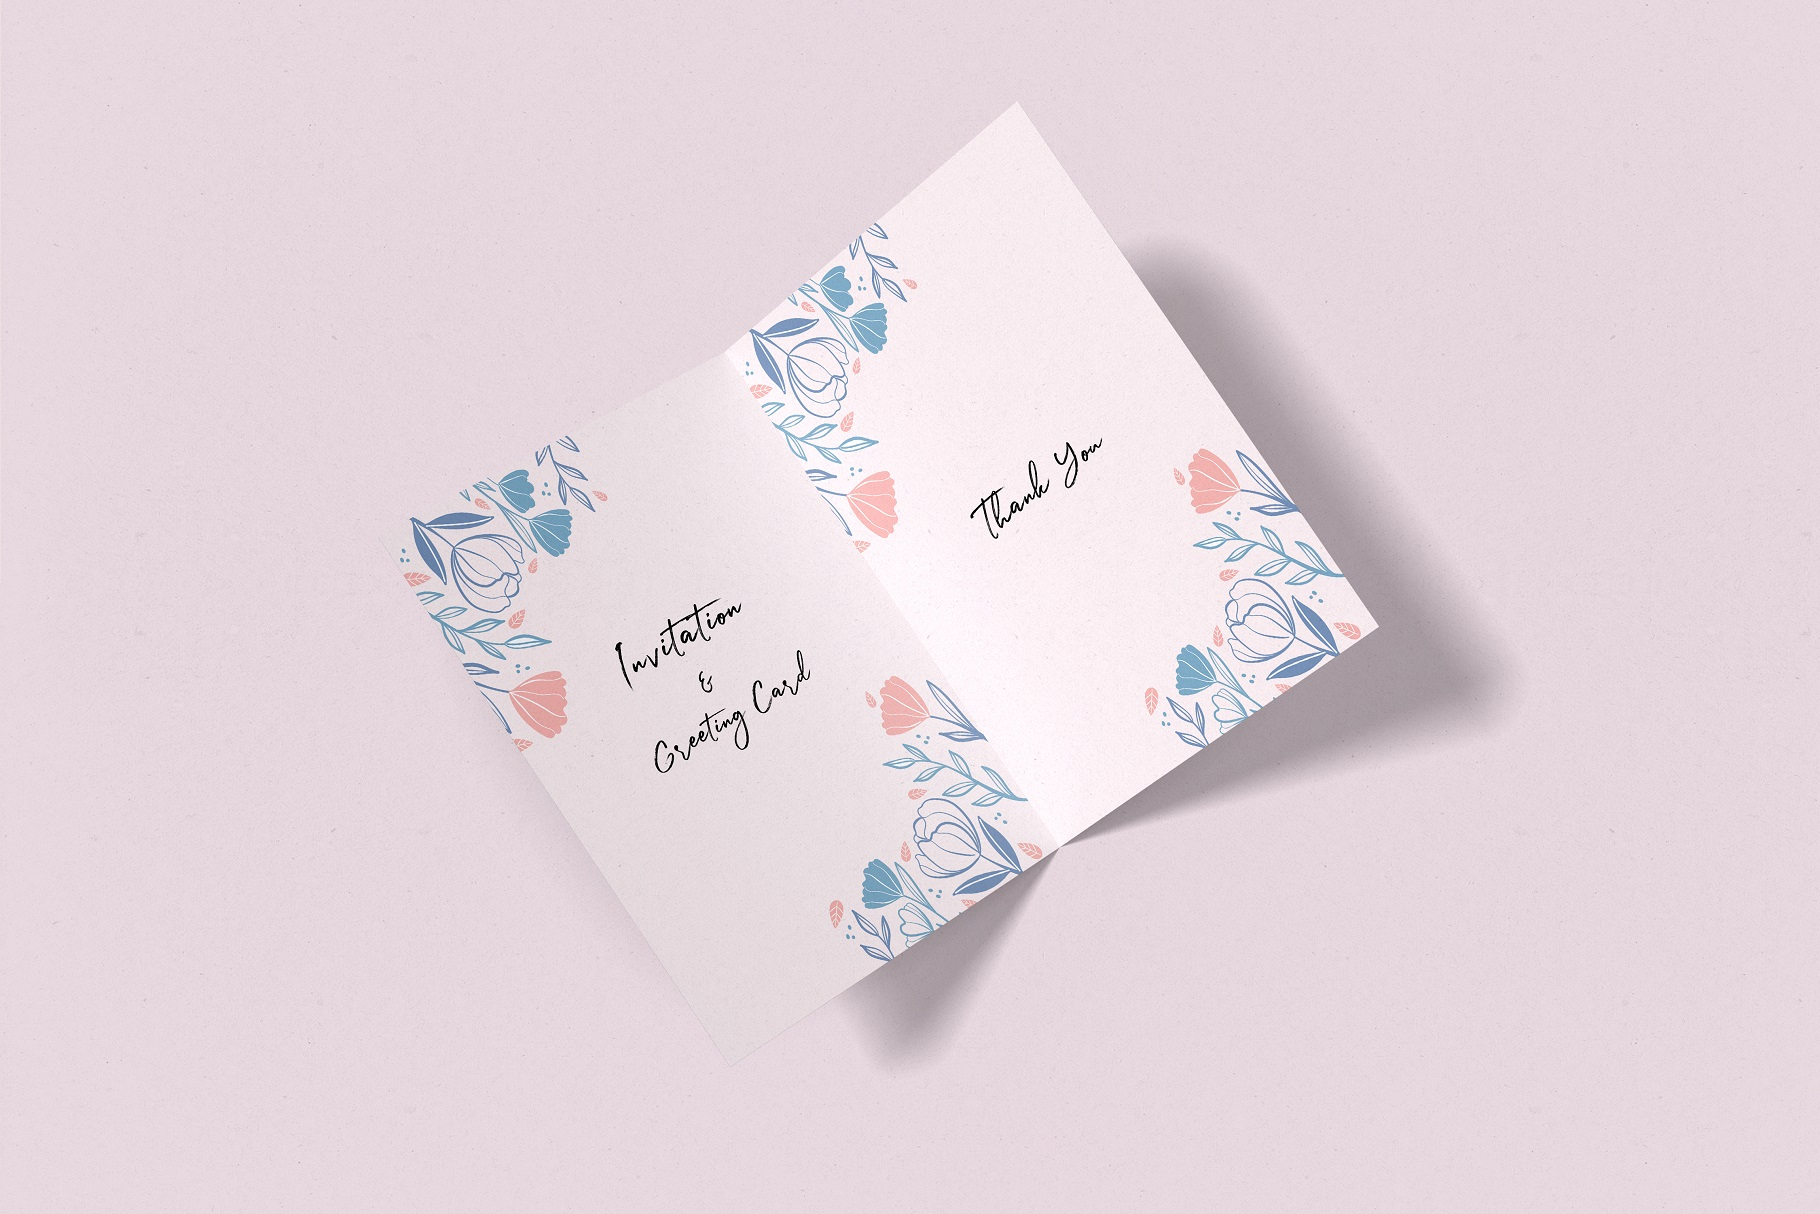 Invitation & Greeting Card Mockup example image 4